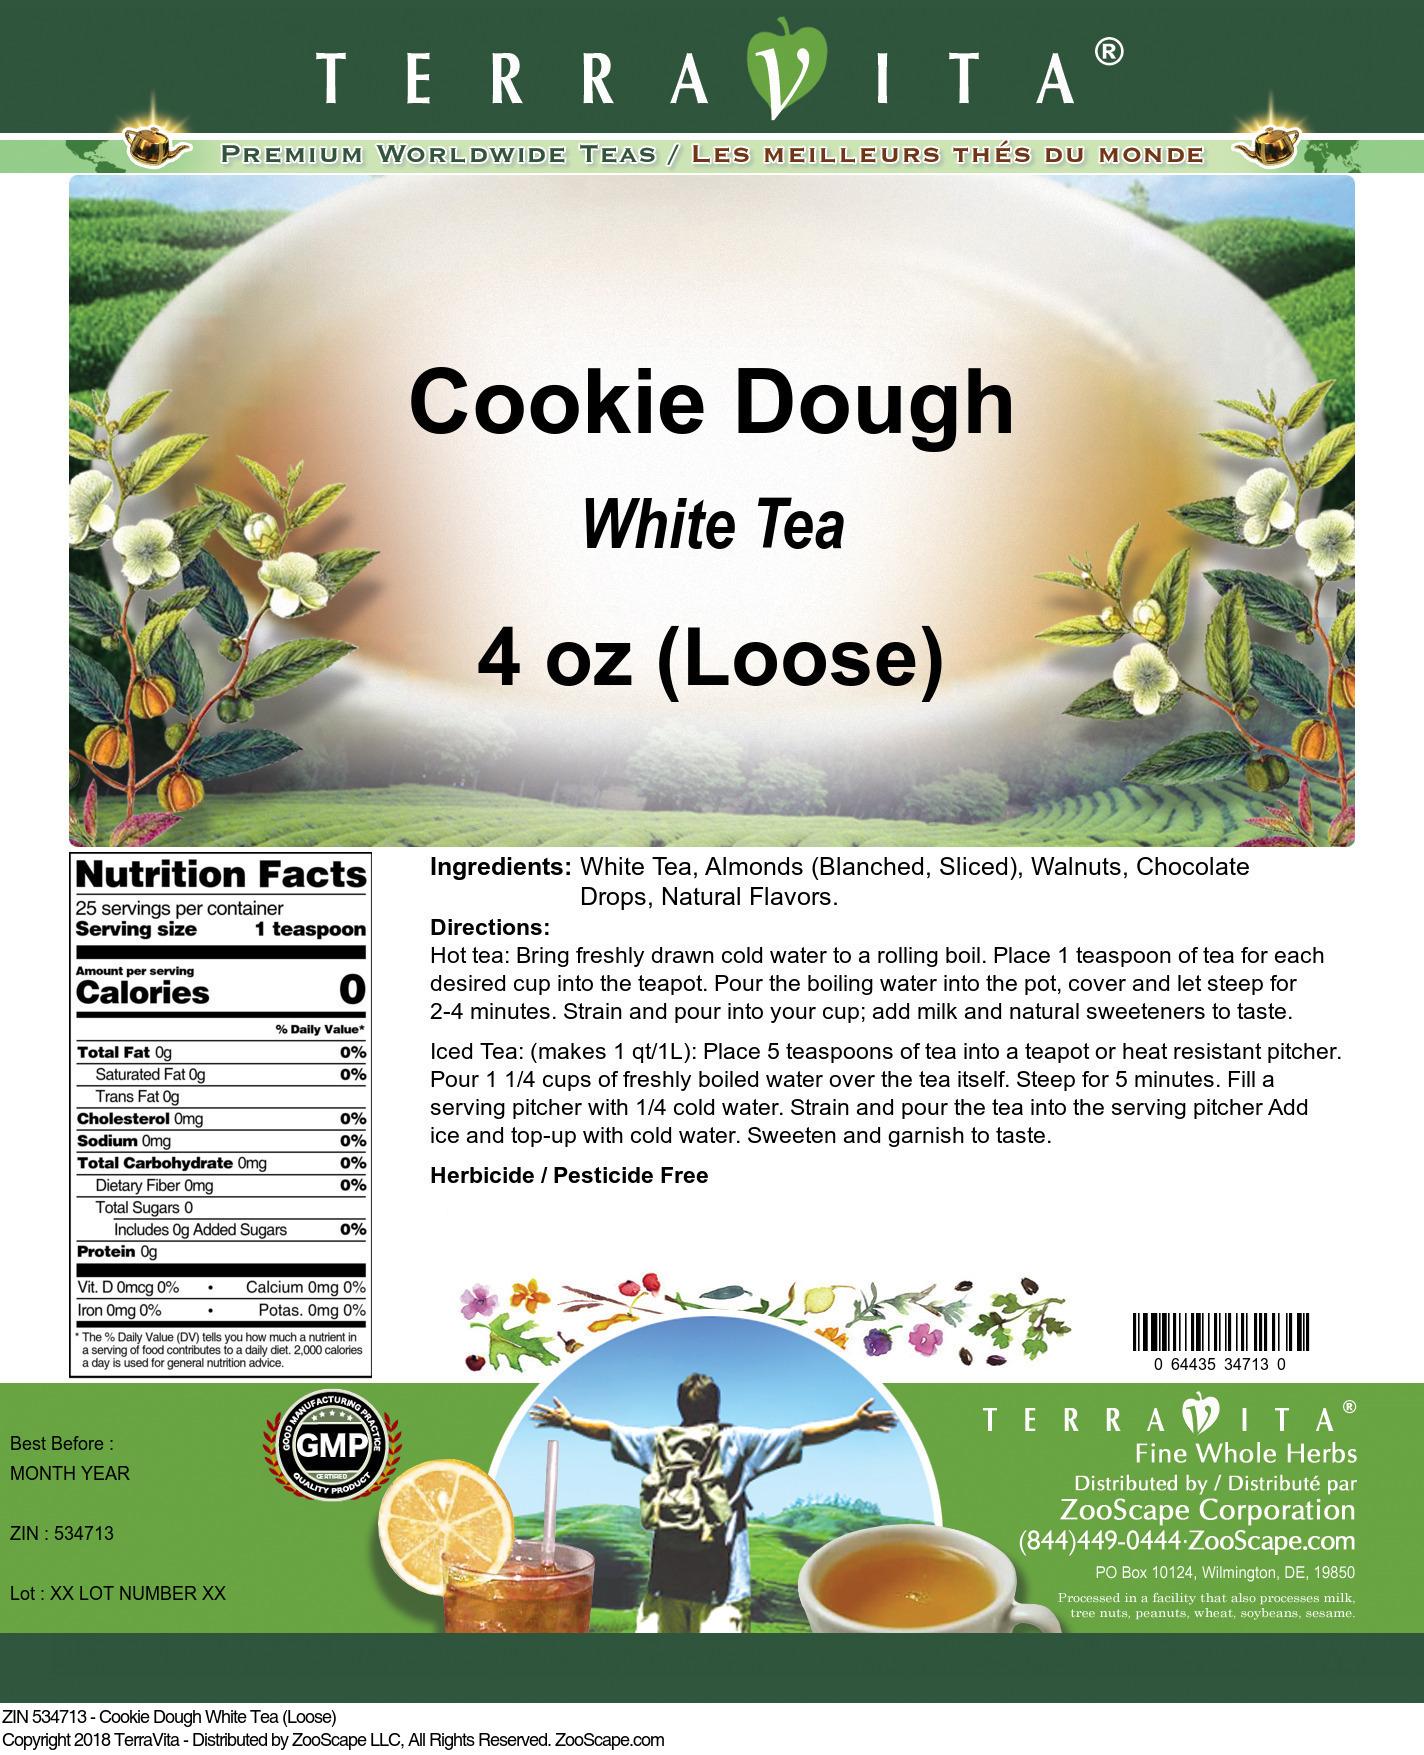 Cookie Dough White Tea (Loose)